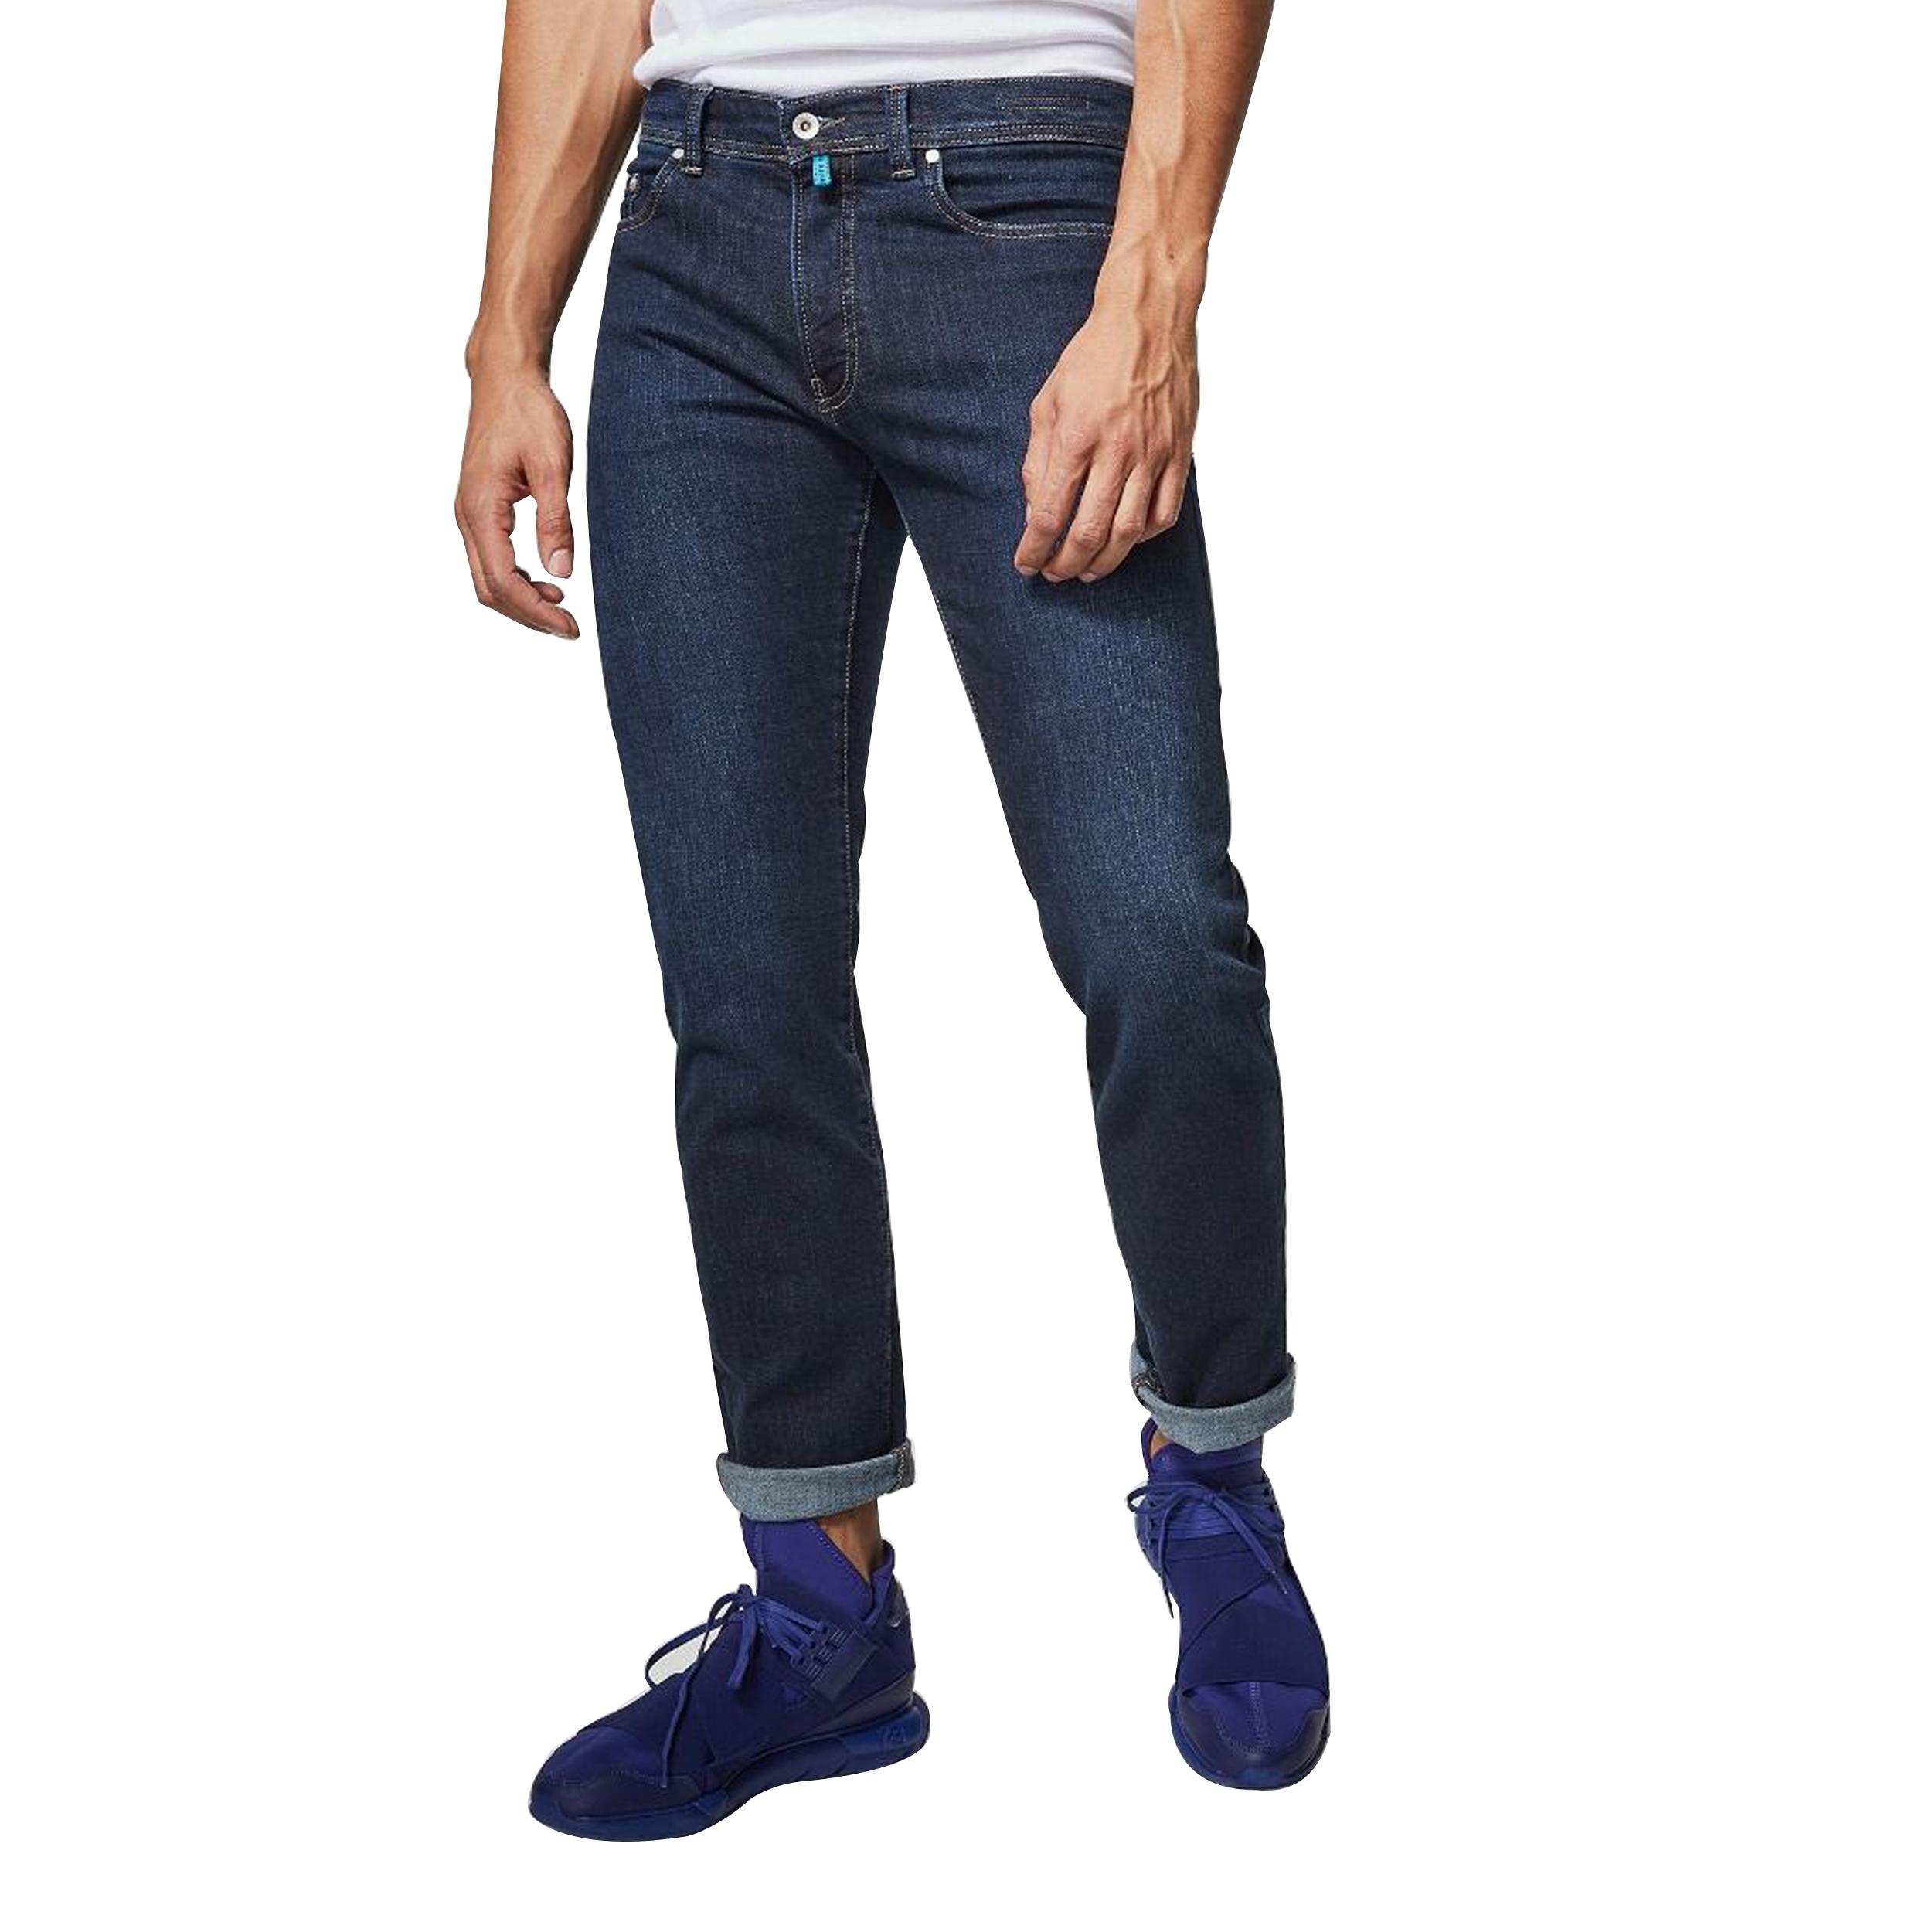 Jean  lyon tapered futurflex en coton mélangé stretch bleu brut